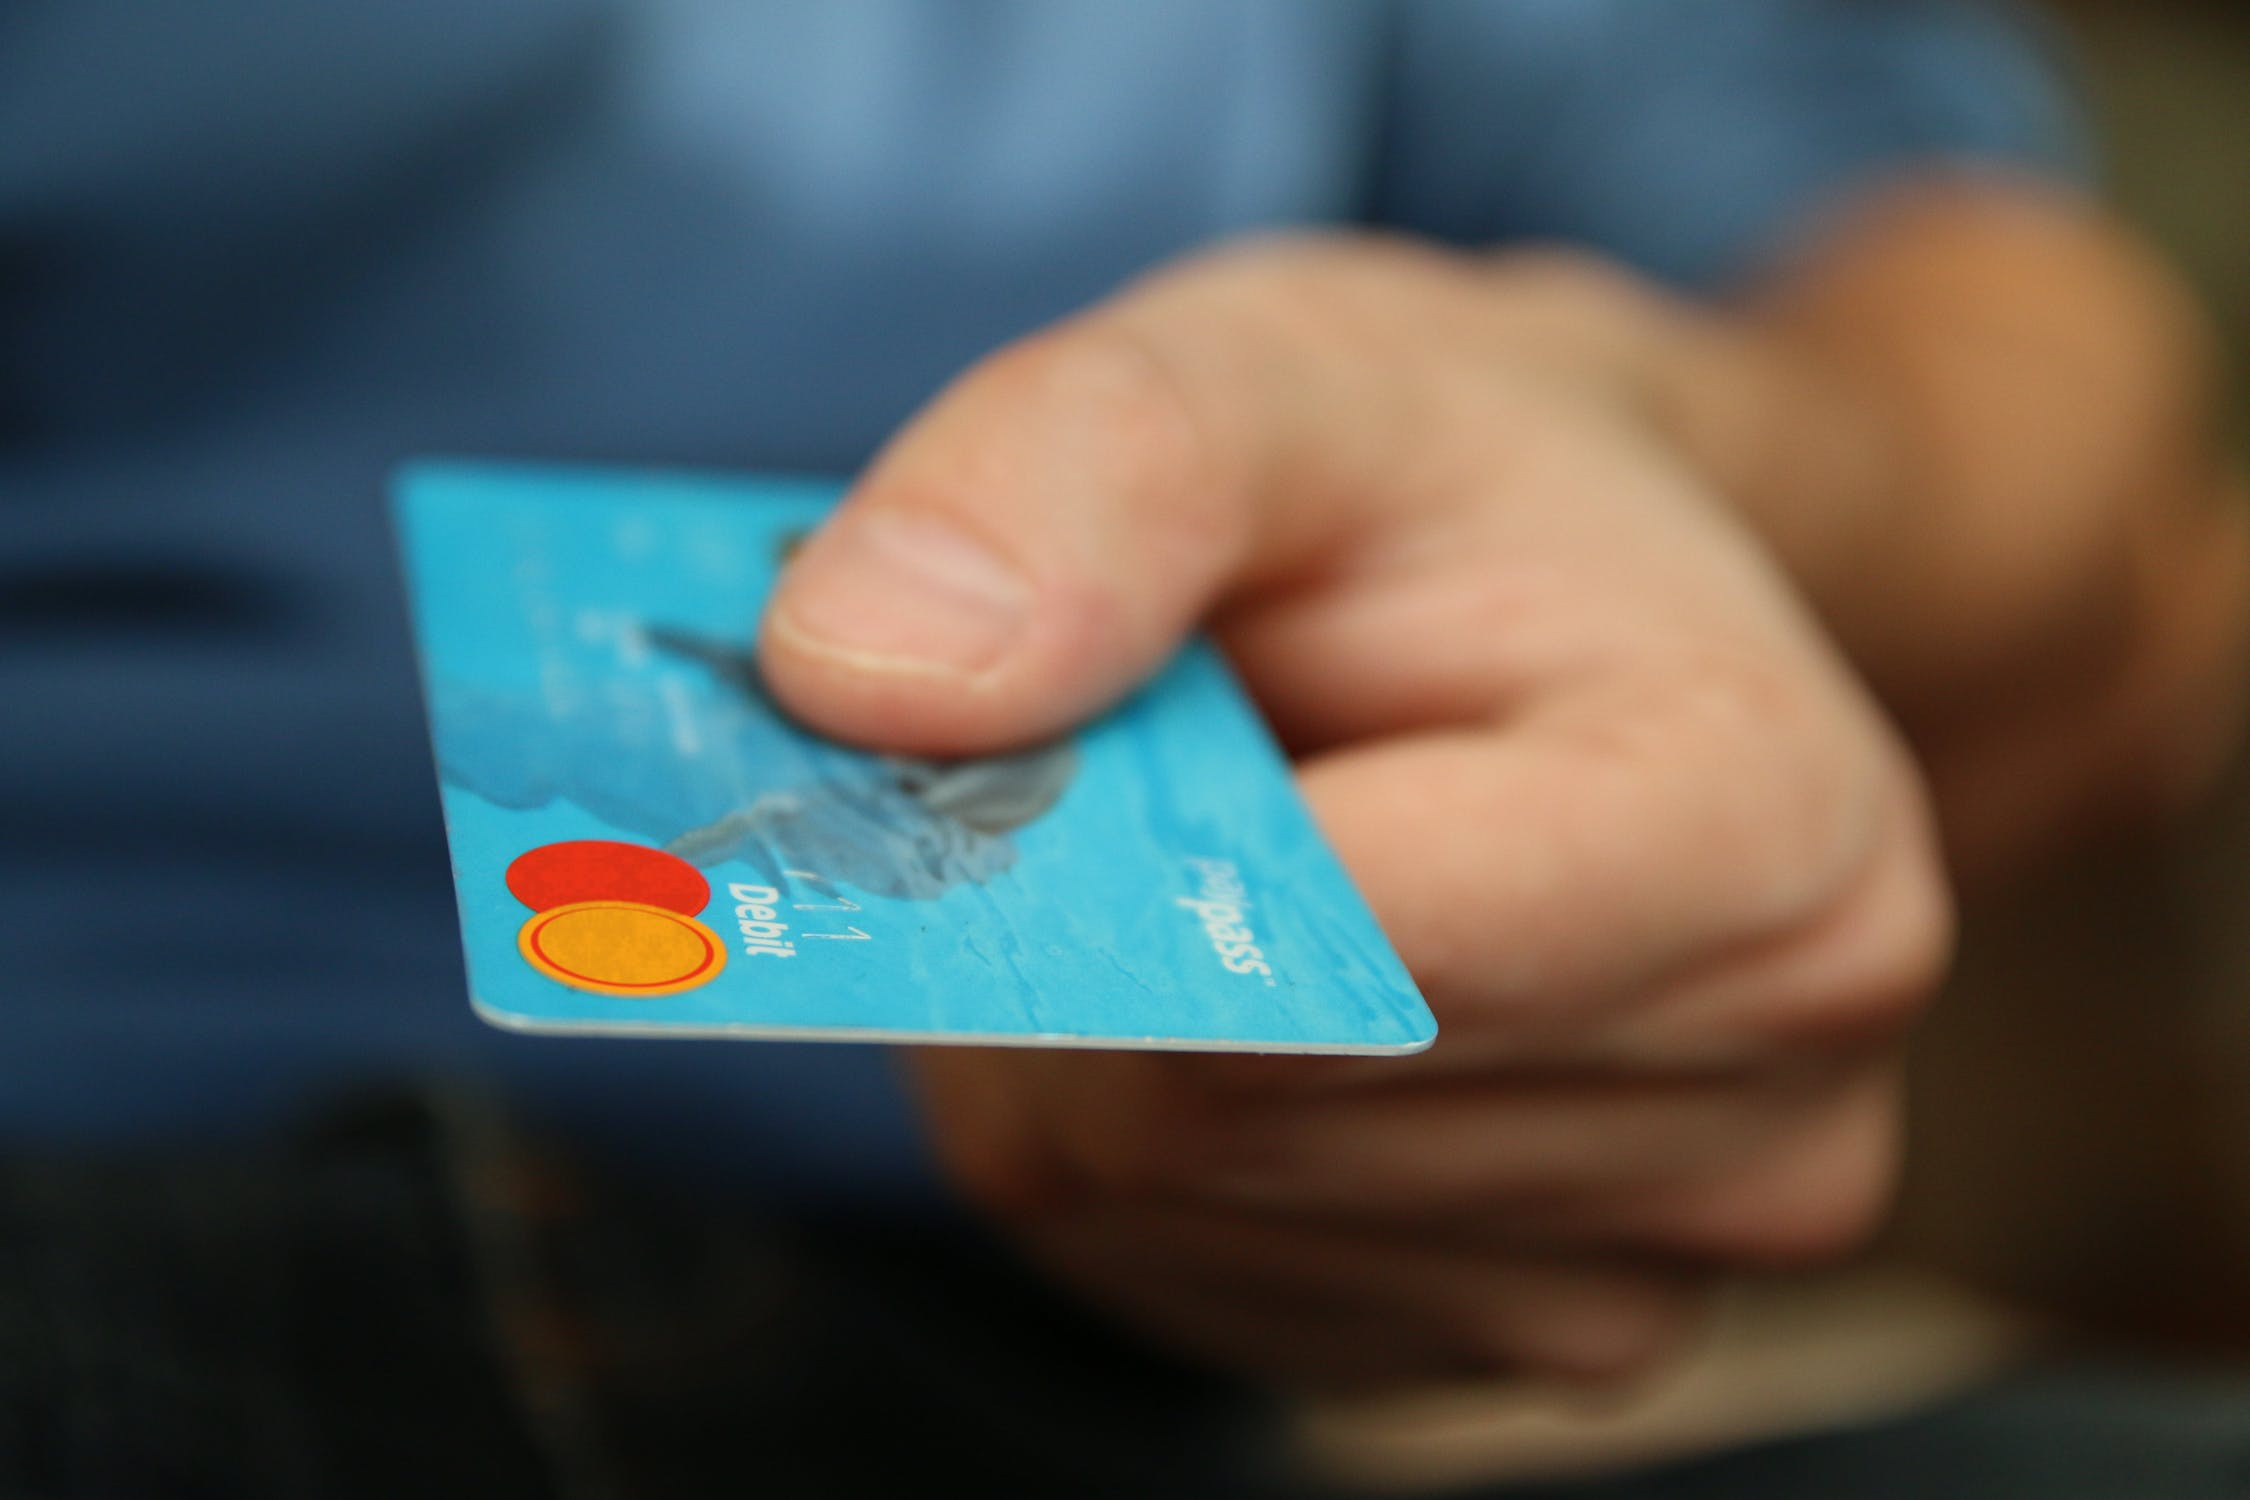 Låne penge kreditkort